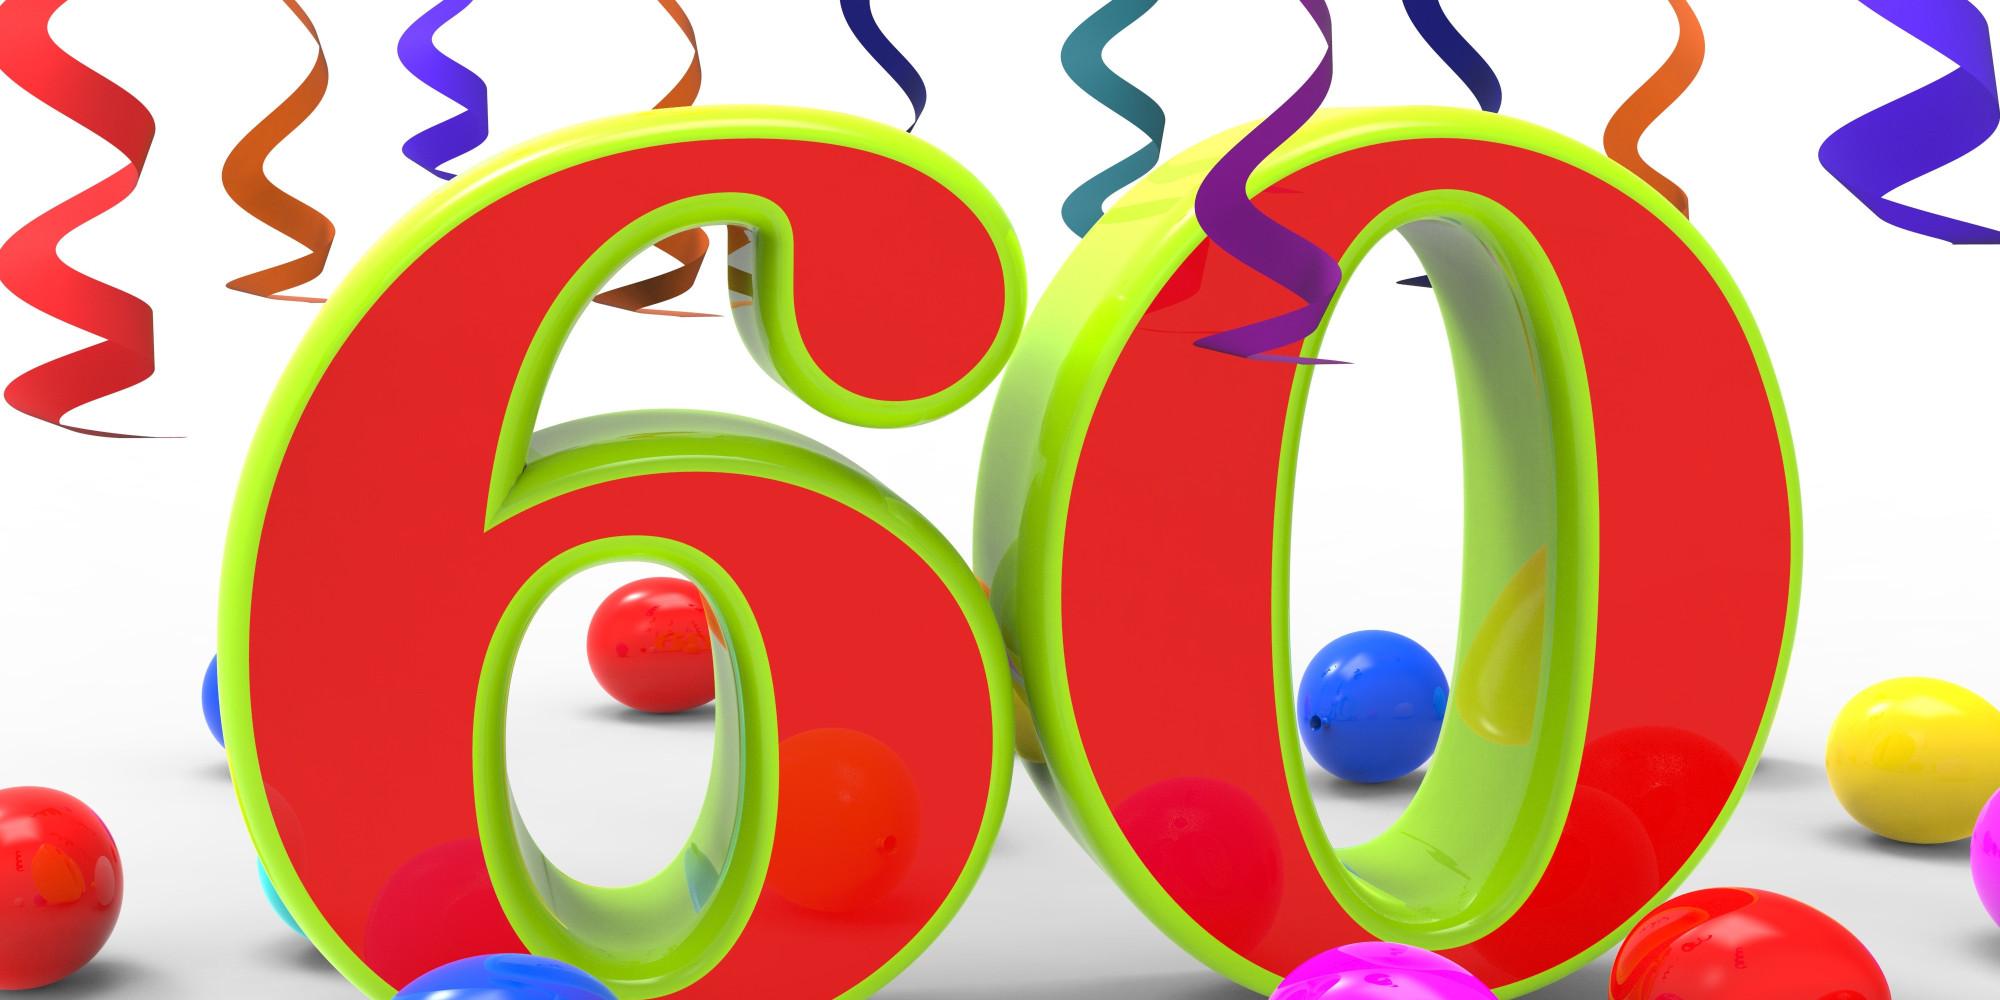 Happy 60Th Birthday Clip Art